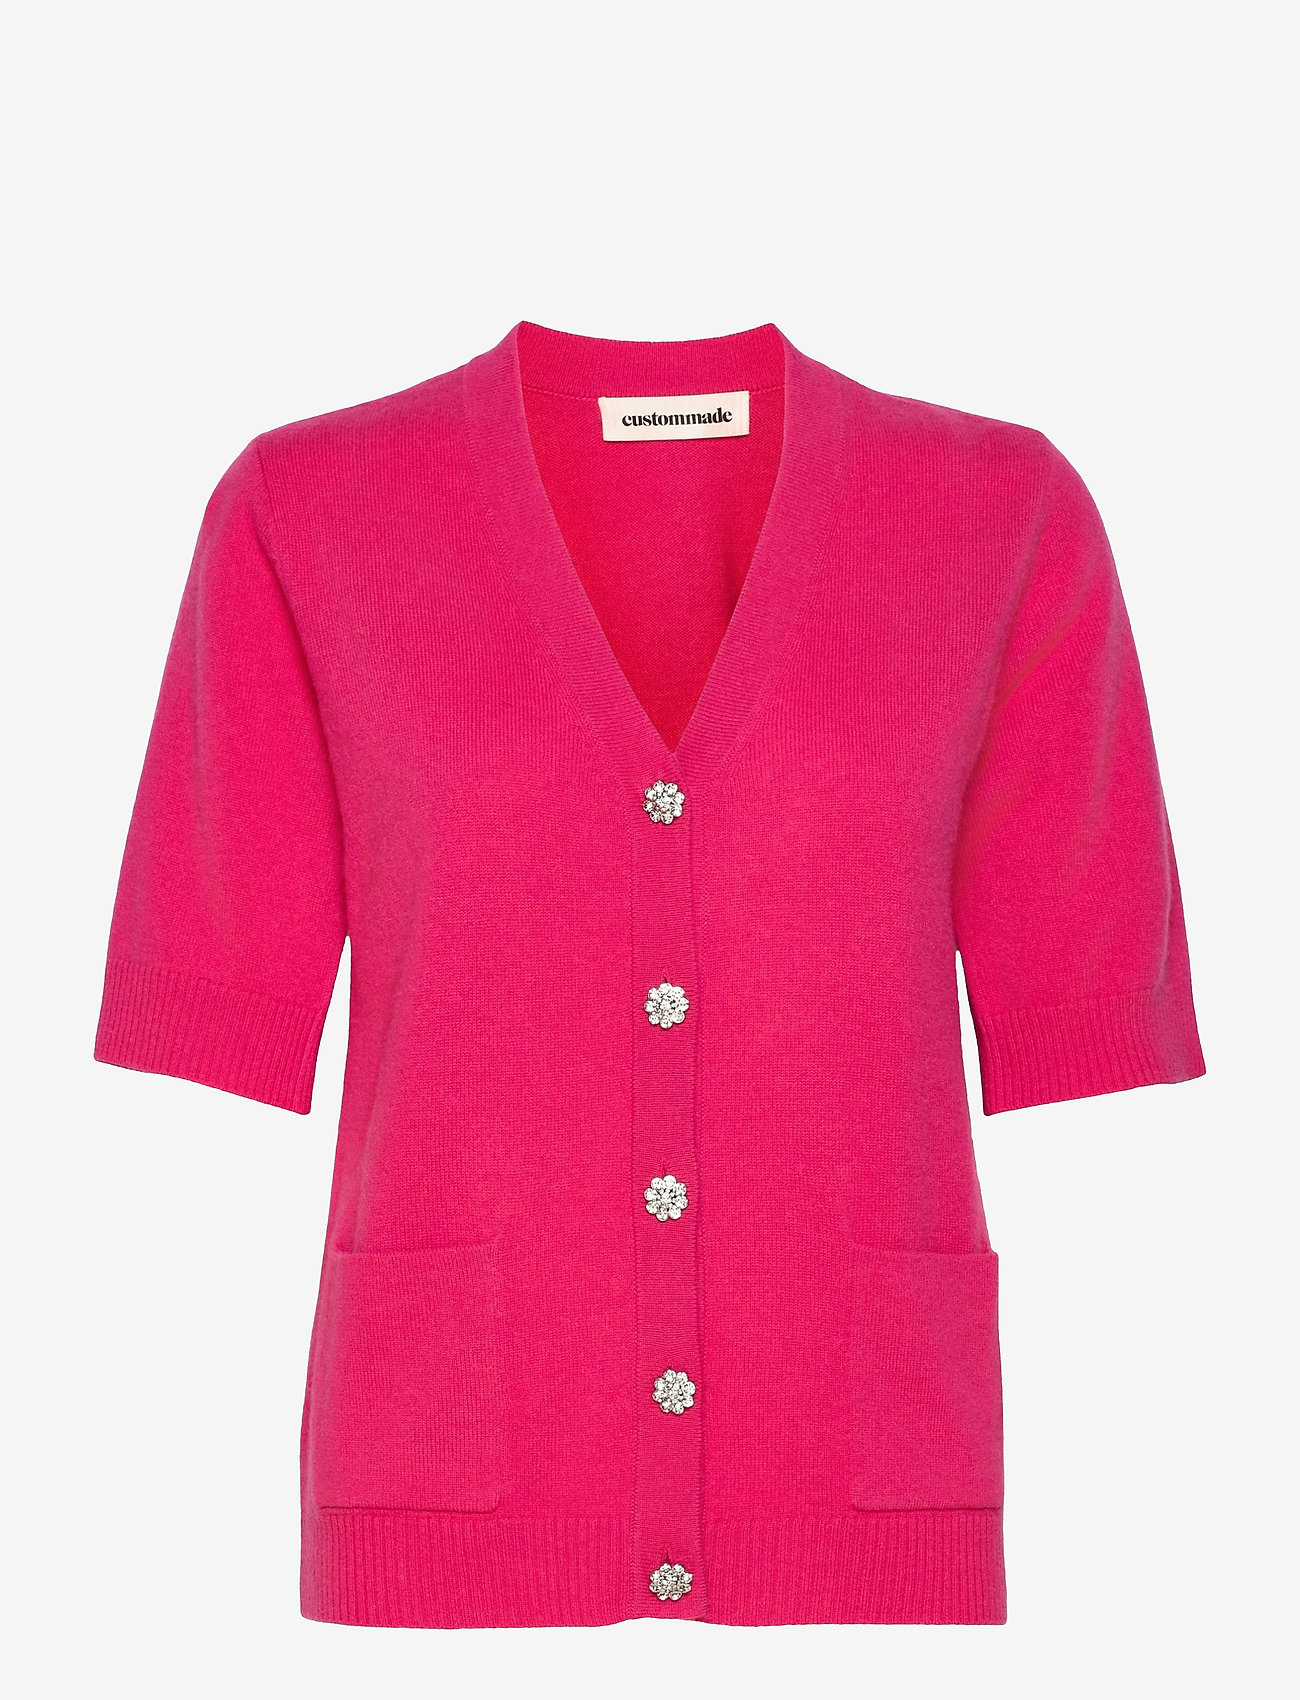 Custommade - Viola - cardigans - chateau rose - 0